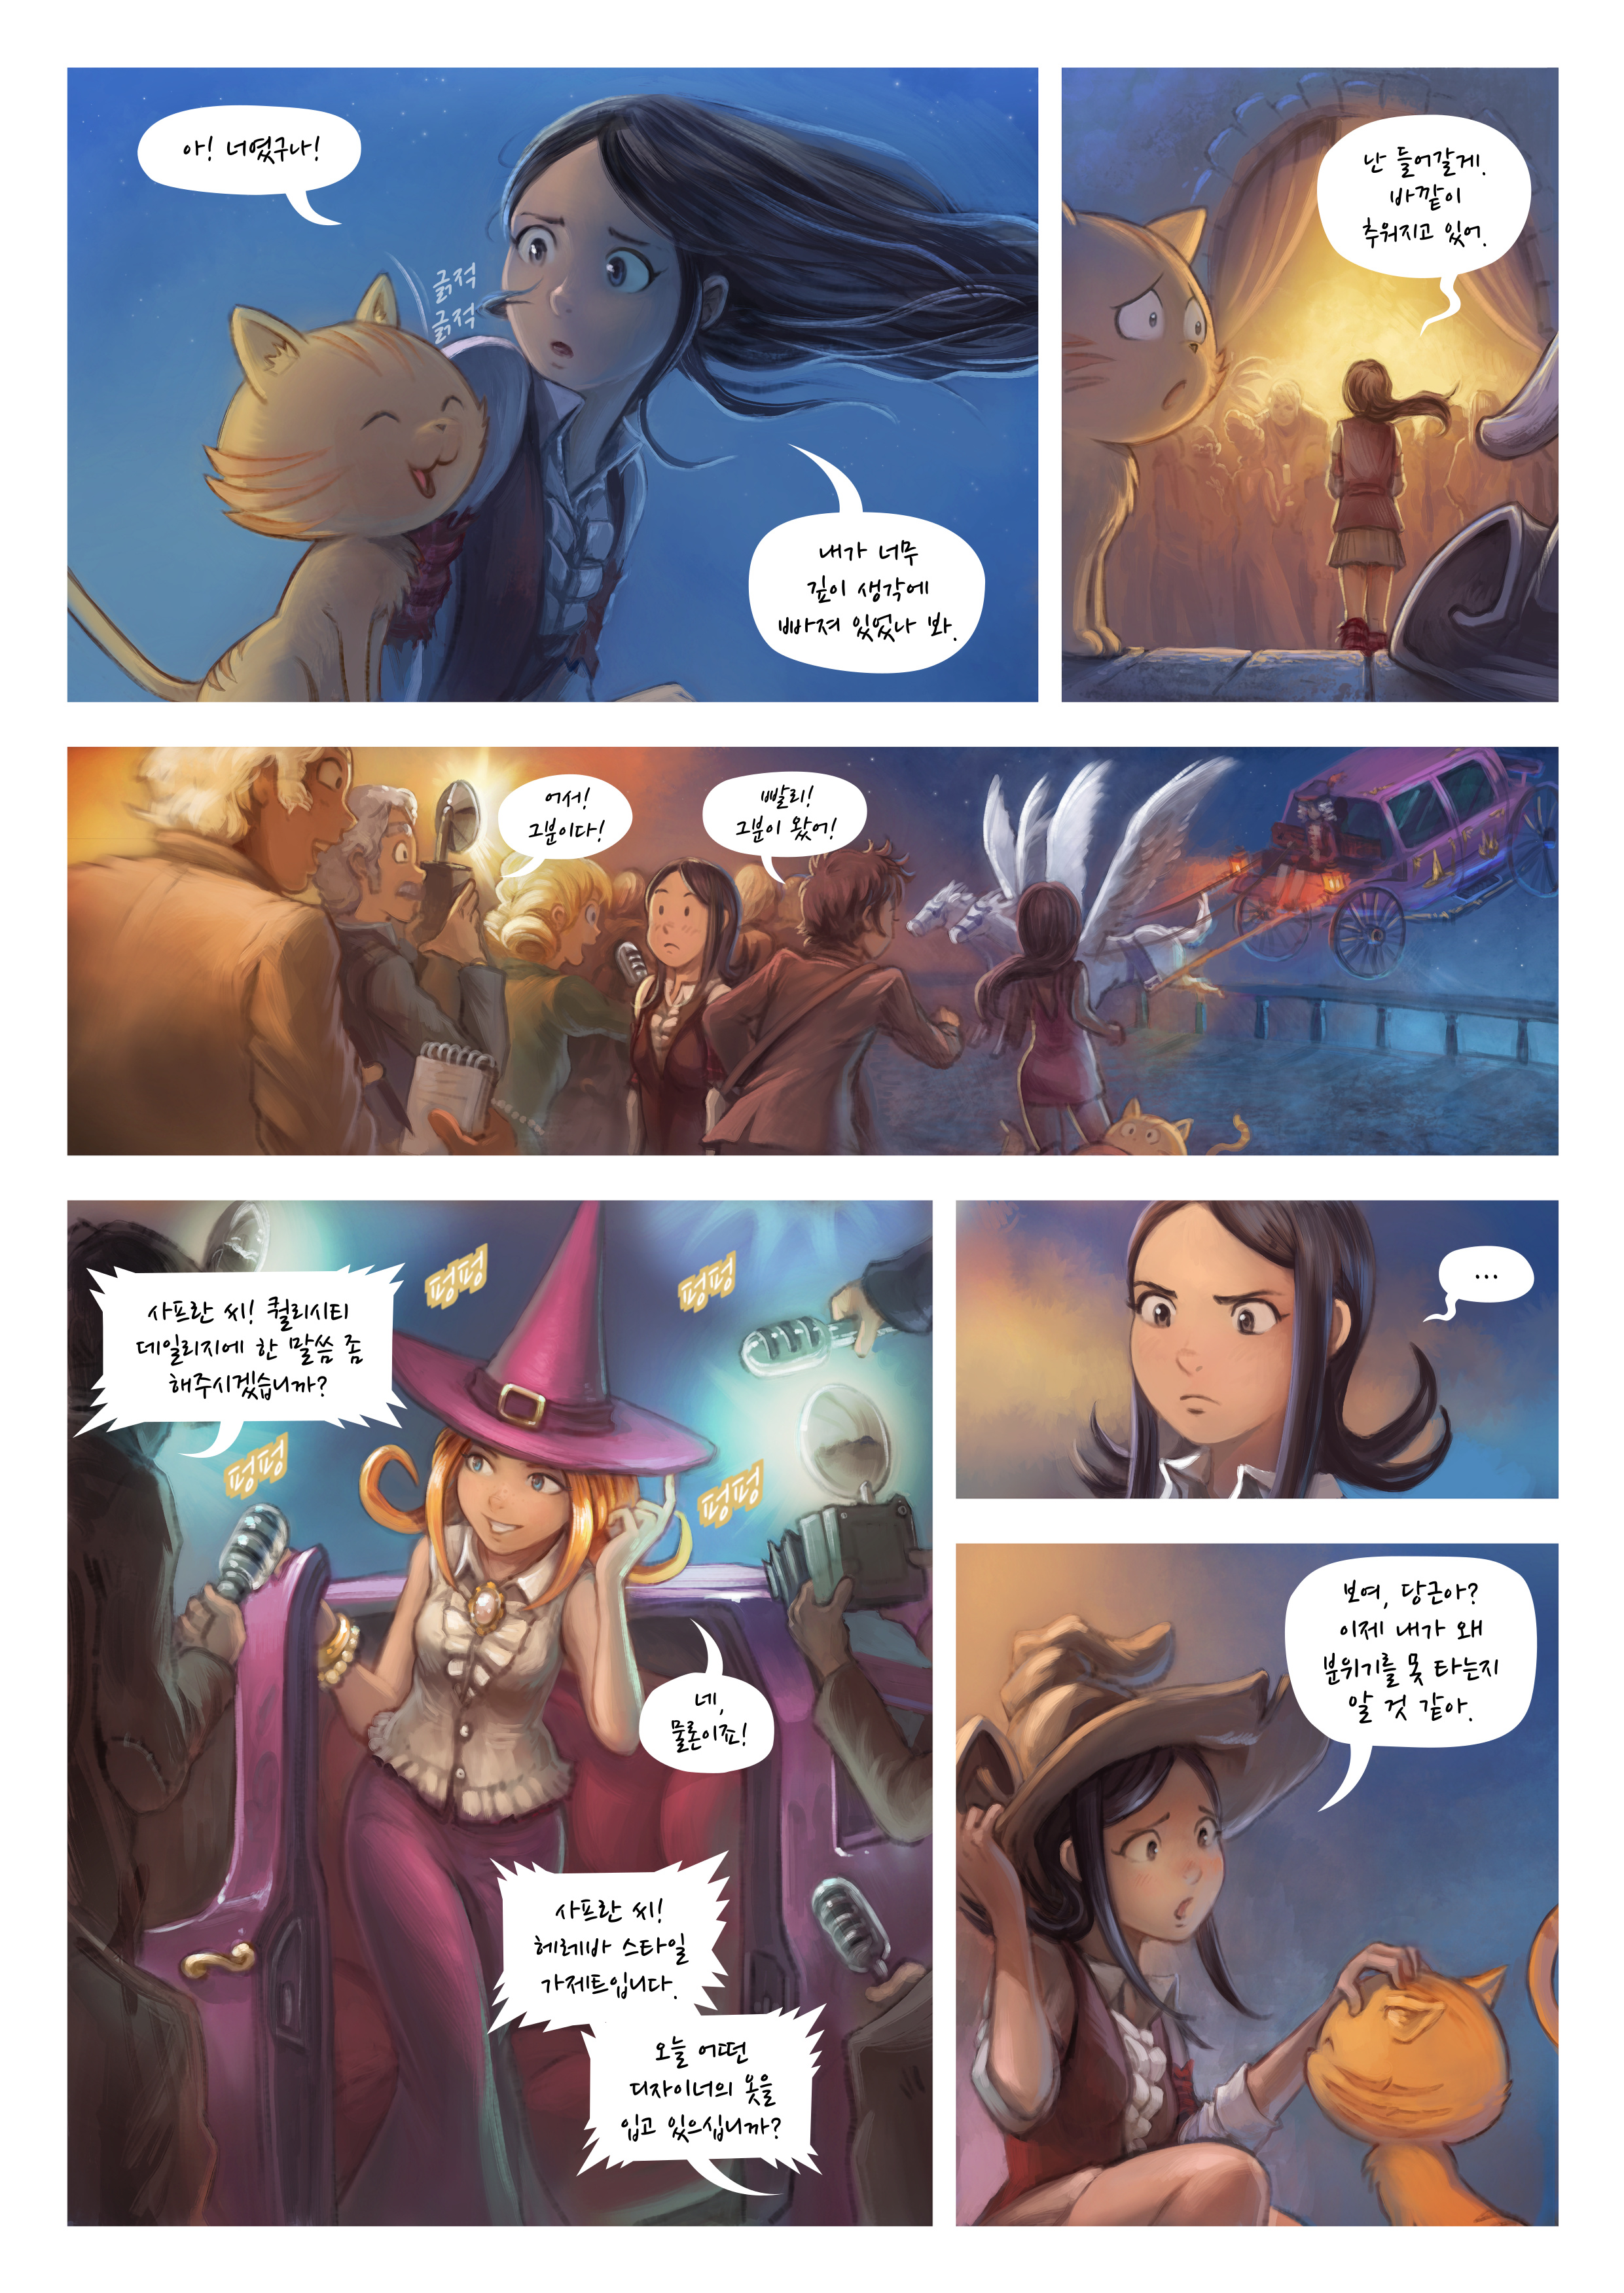 A webcomic page of Pepper&Carrot, 에피소드 28 [kr], 페이지 4